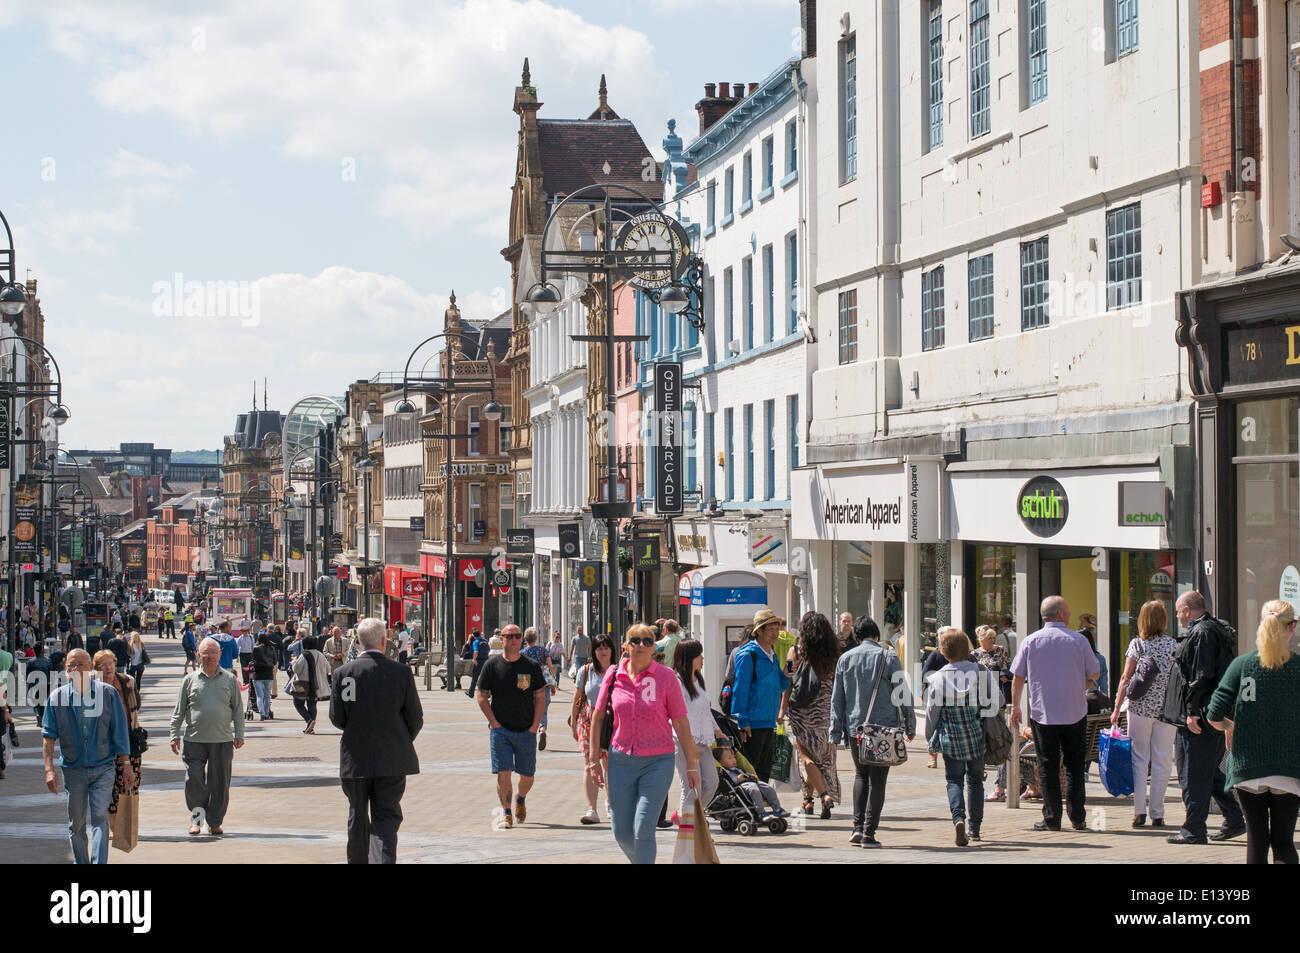 People shopping in Briggate, Leeds city centre, England UK - Stock Image